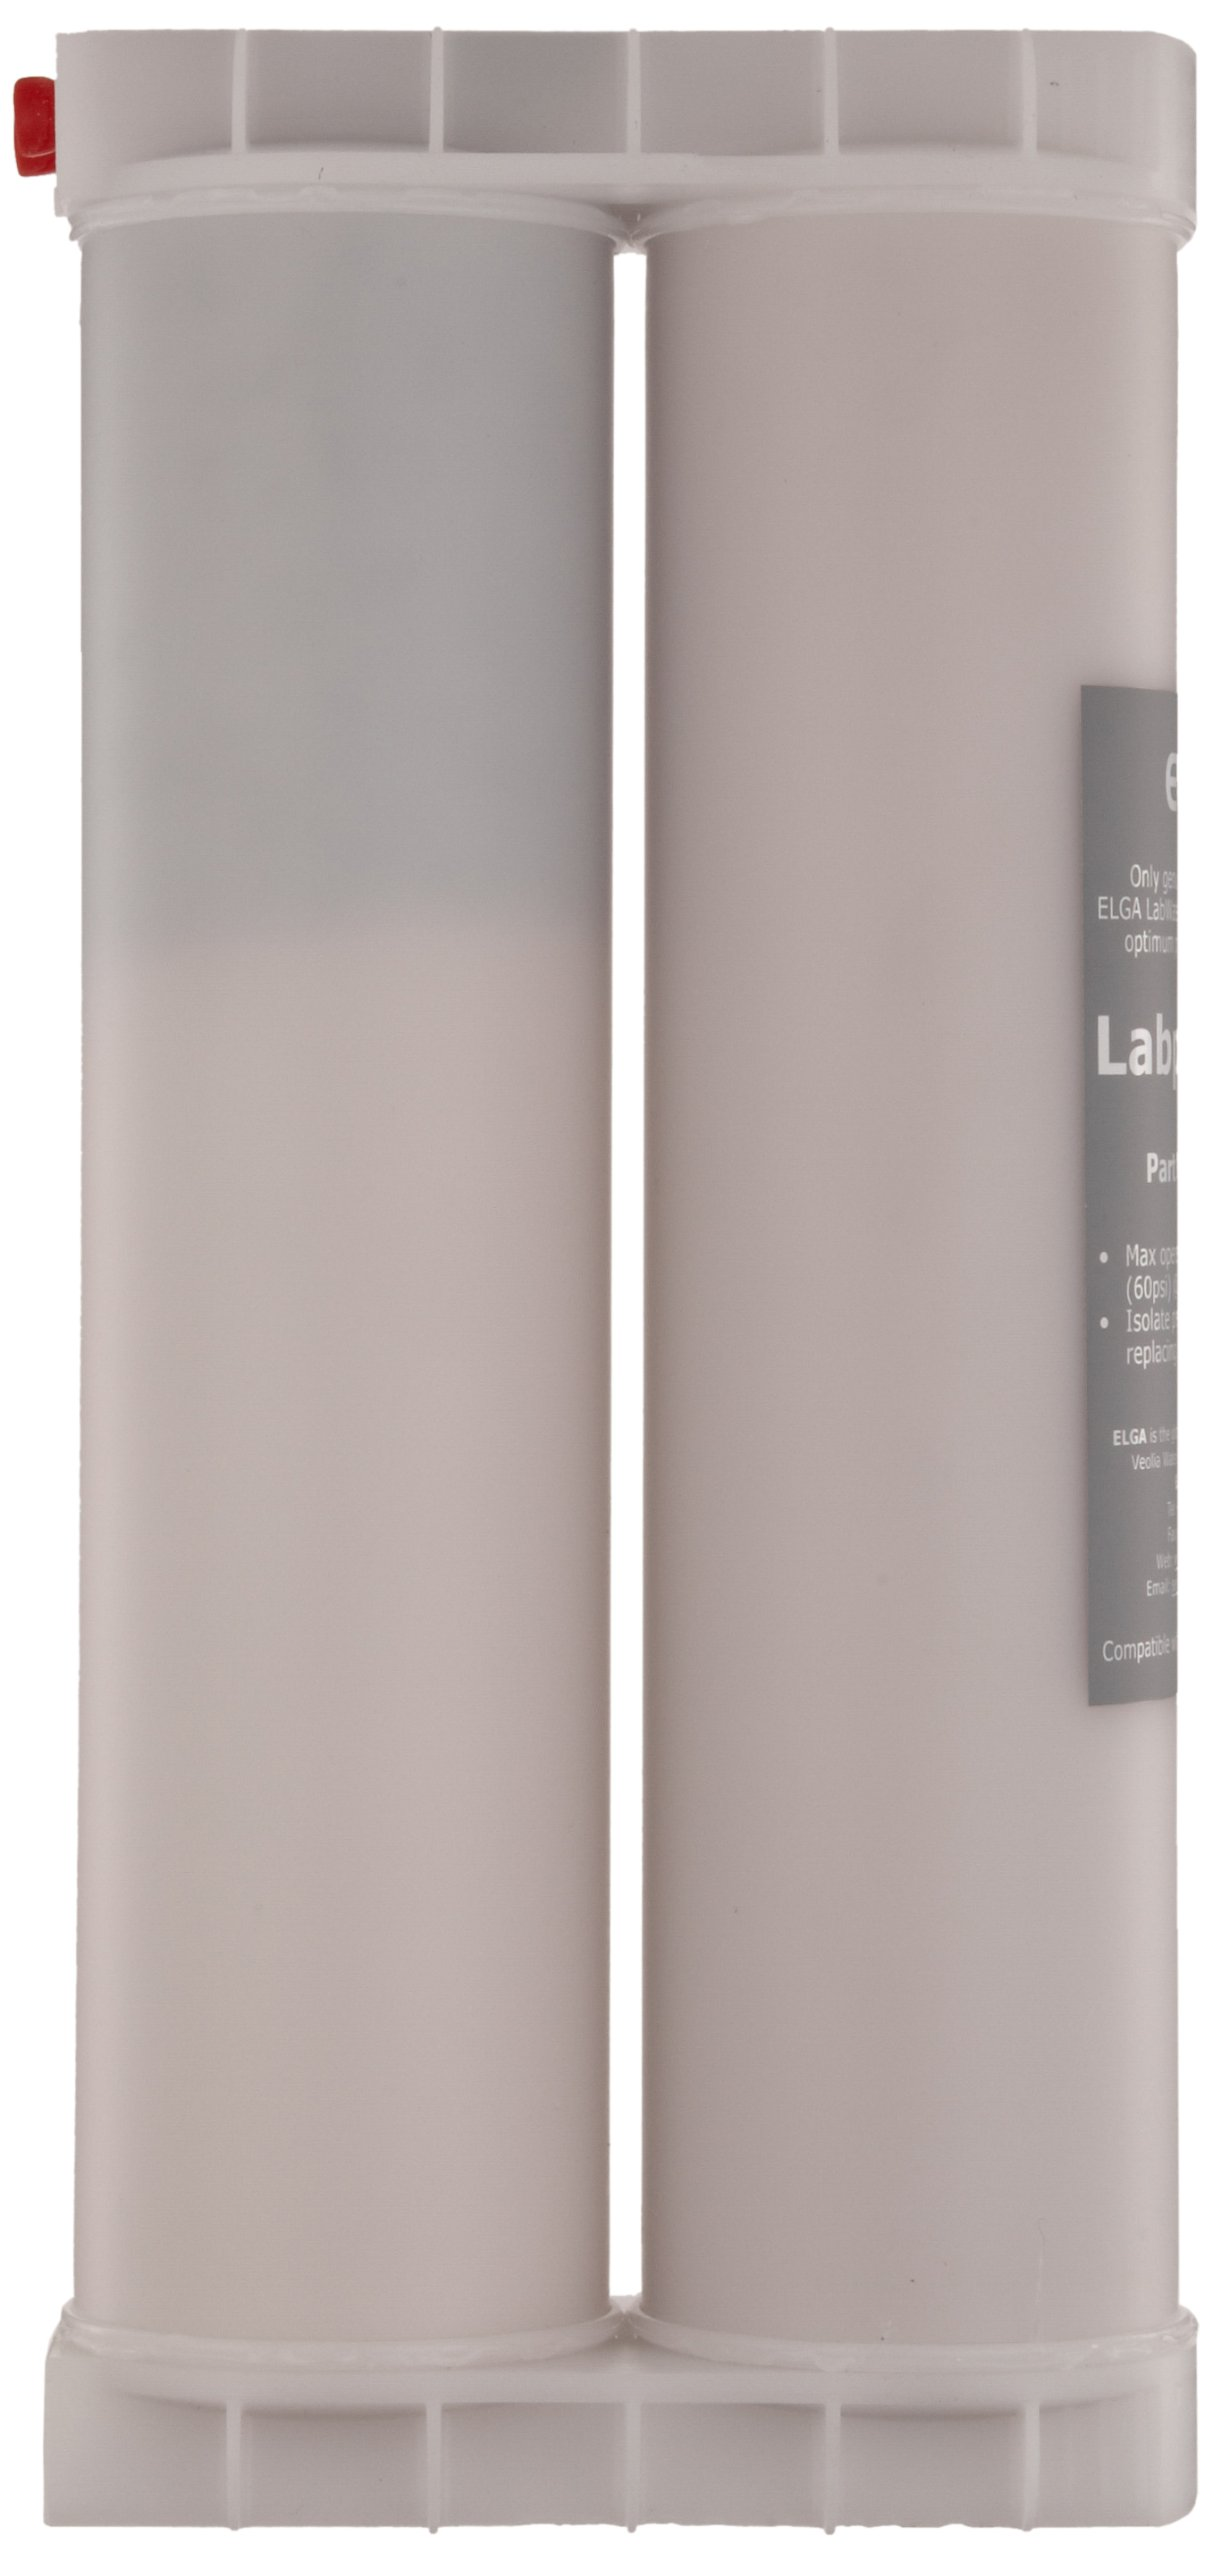 Elga LC186 Labpure S5 Purification Cartridge, For Purelab Classic by Elga